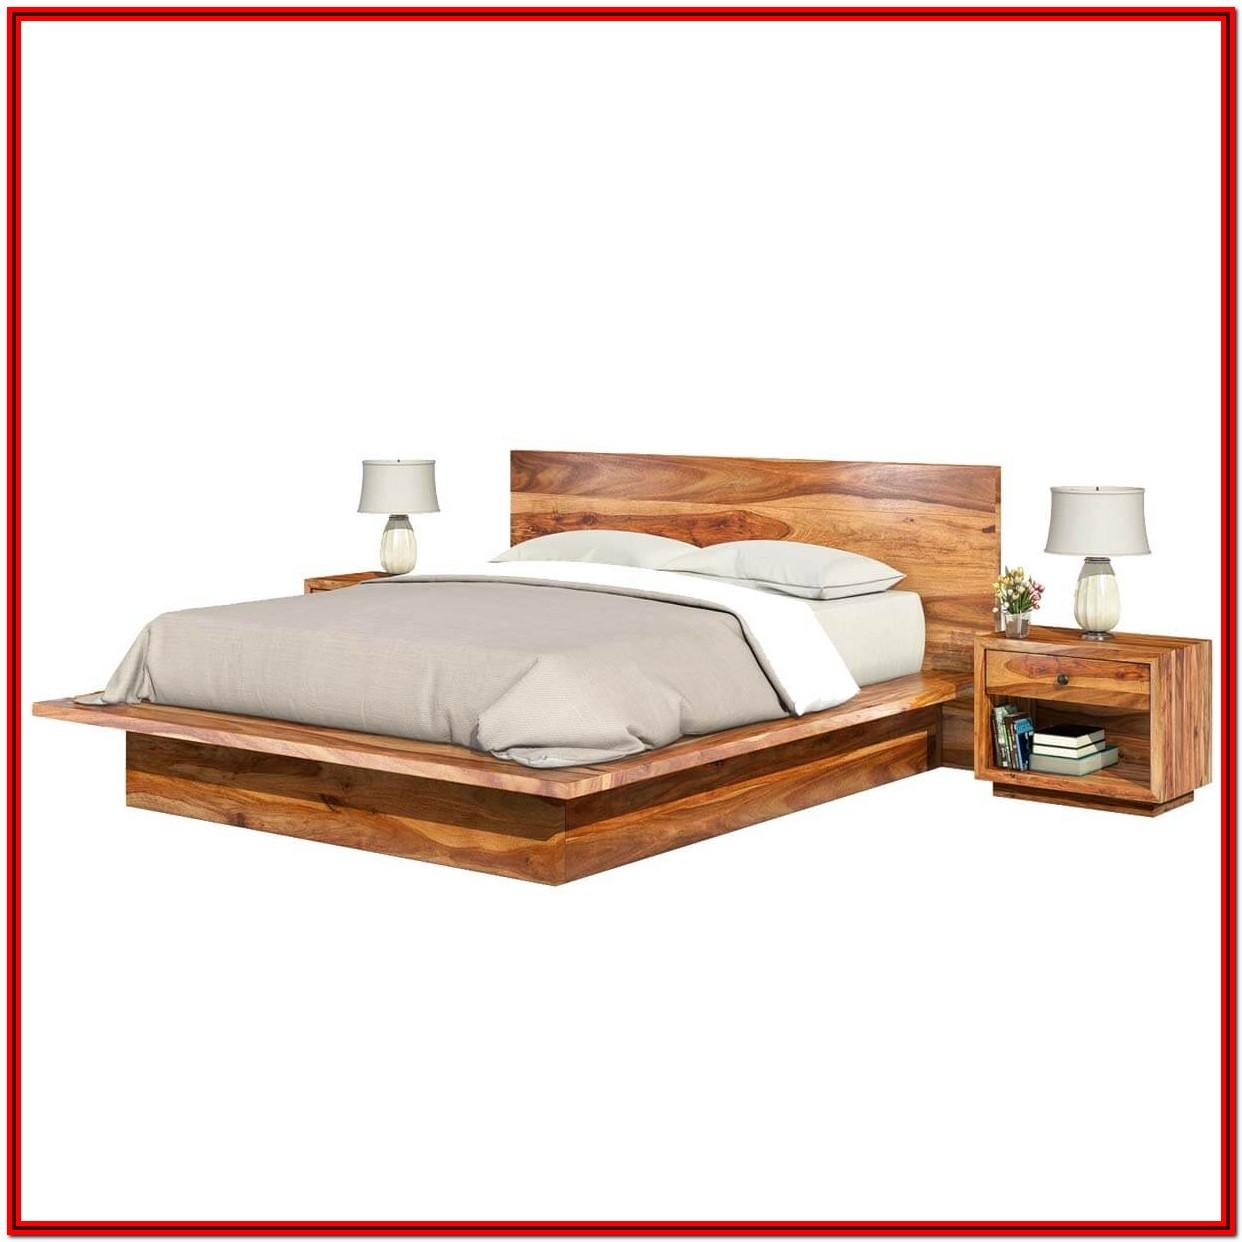 Bed Frames King Size Wooden